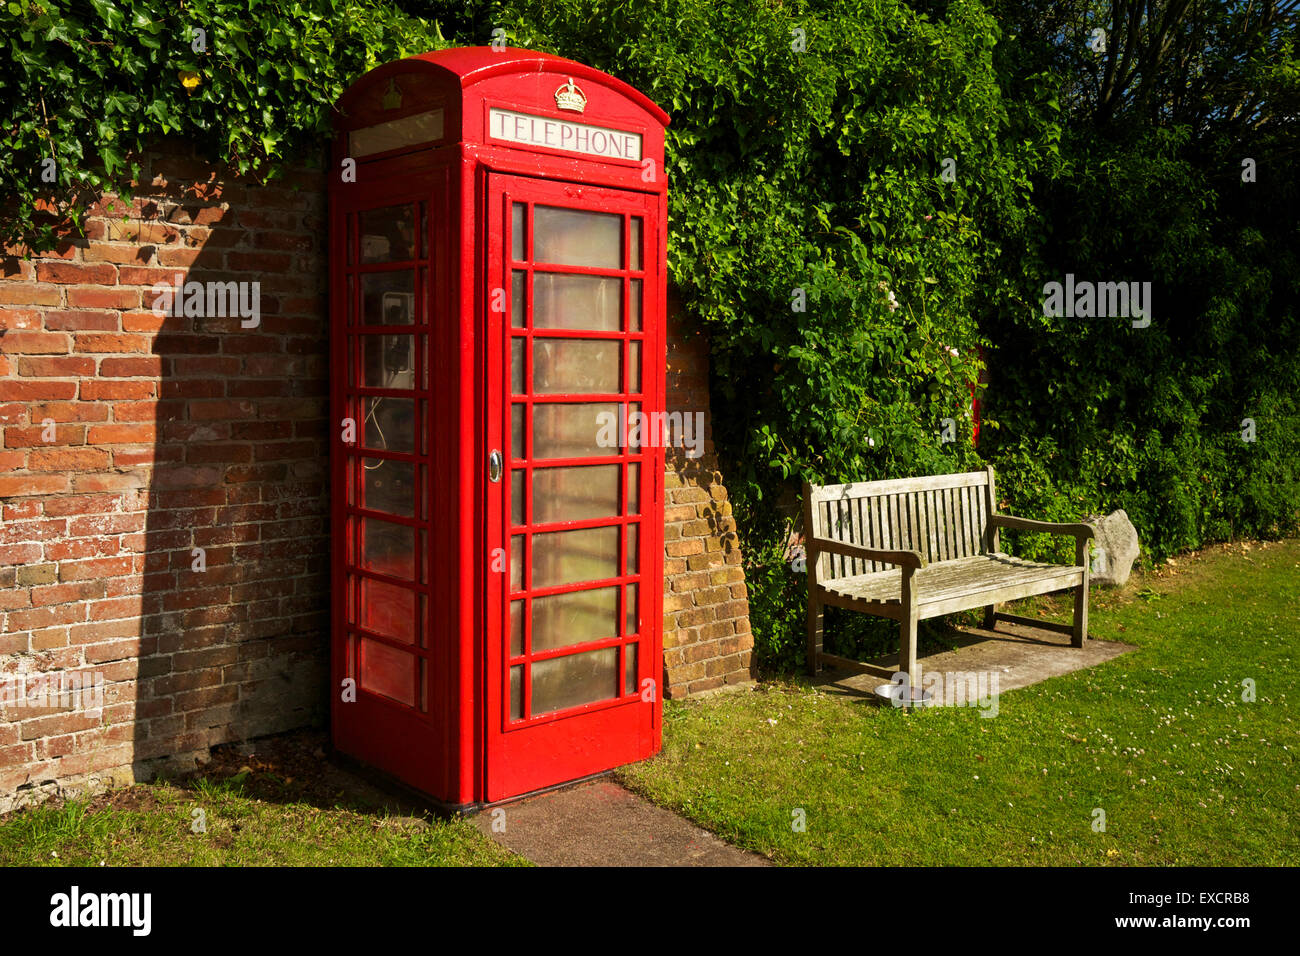 Red Telephone Kiosk in Chesterton Shropshire West Midlands England UK - Stock Image